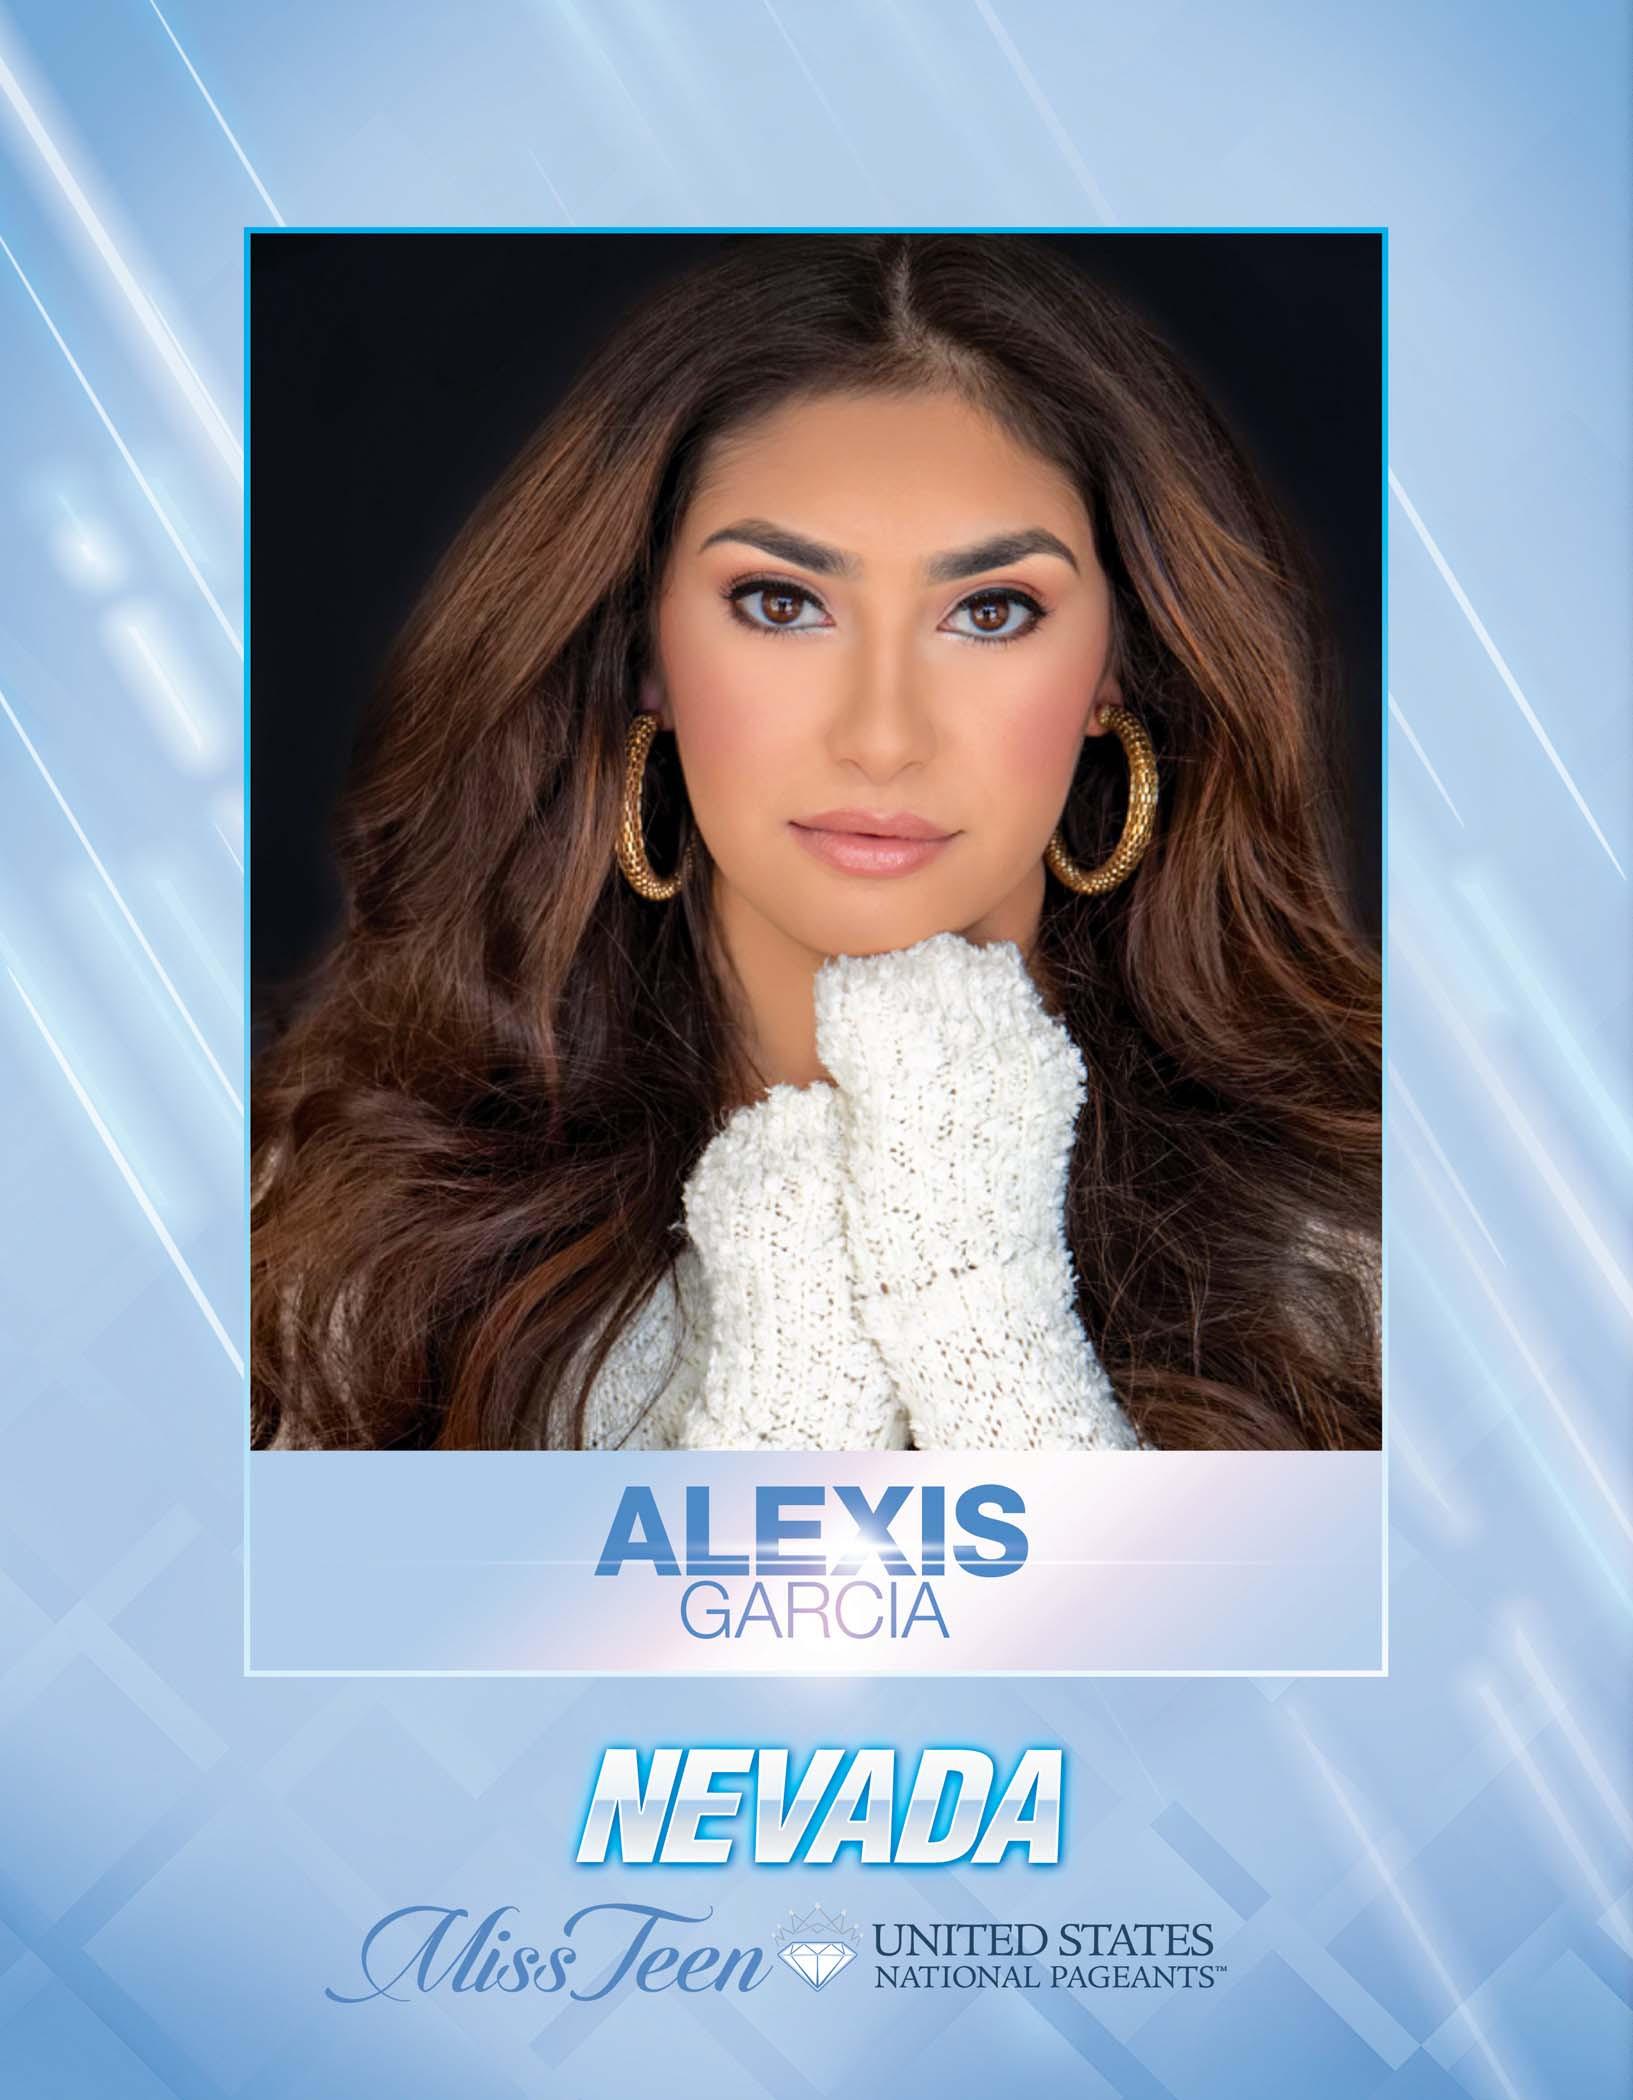 Alexis Garcia Miss Teen Nevada United States - 2021